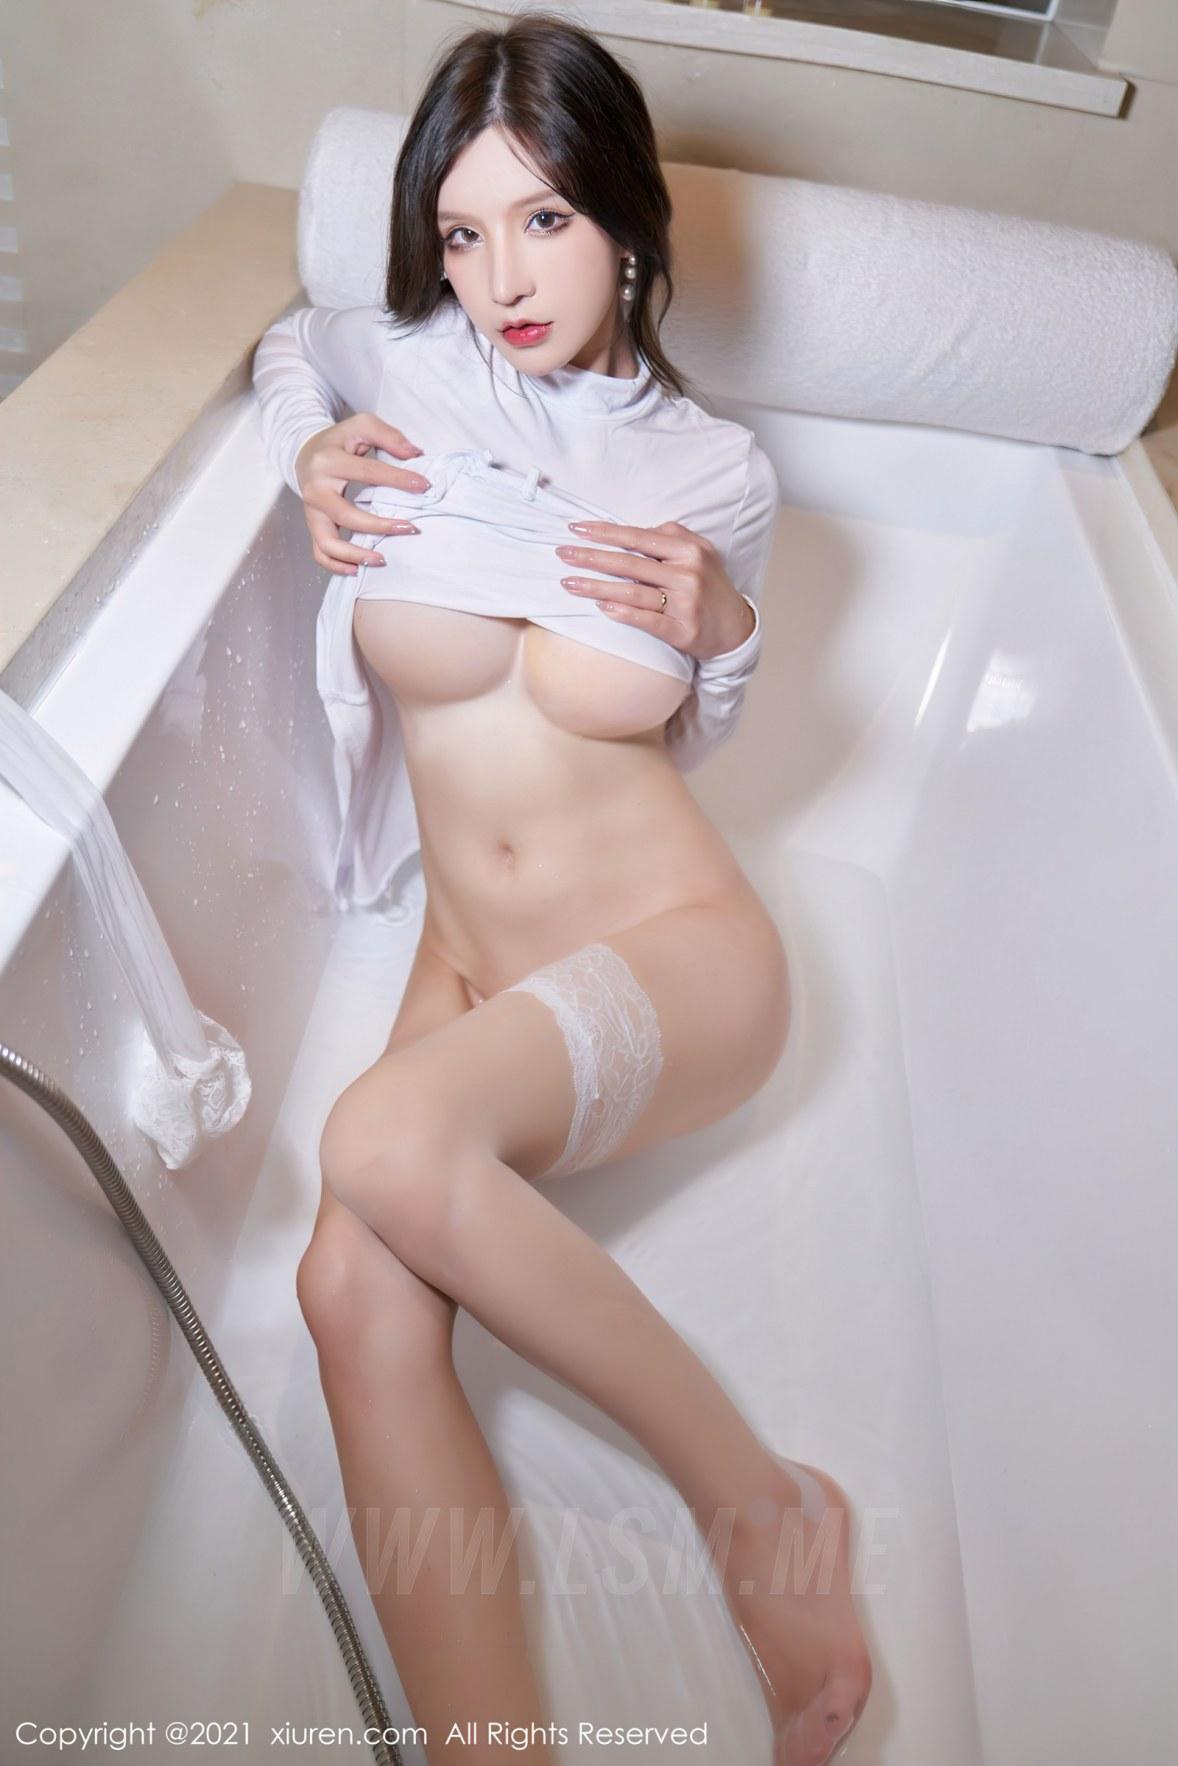 3680 094 qso 3603 5400 - XiuRen 秀人 No.3680 浴室蕾丝袜 周于希Sandy 性感写真111 - 秀人网 -【免费在线写真】【丽人丝语】